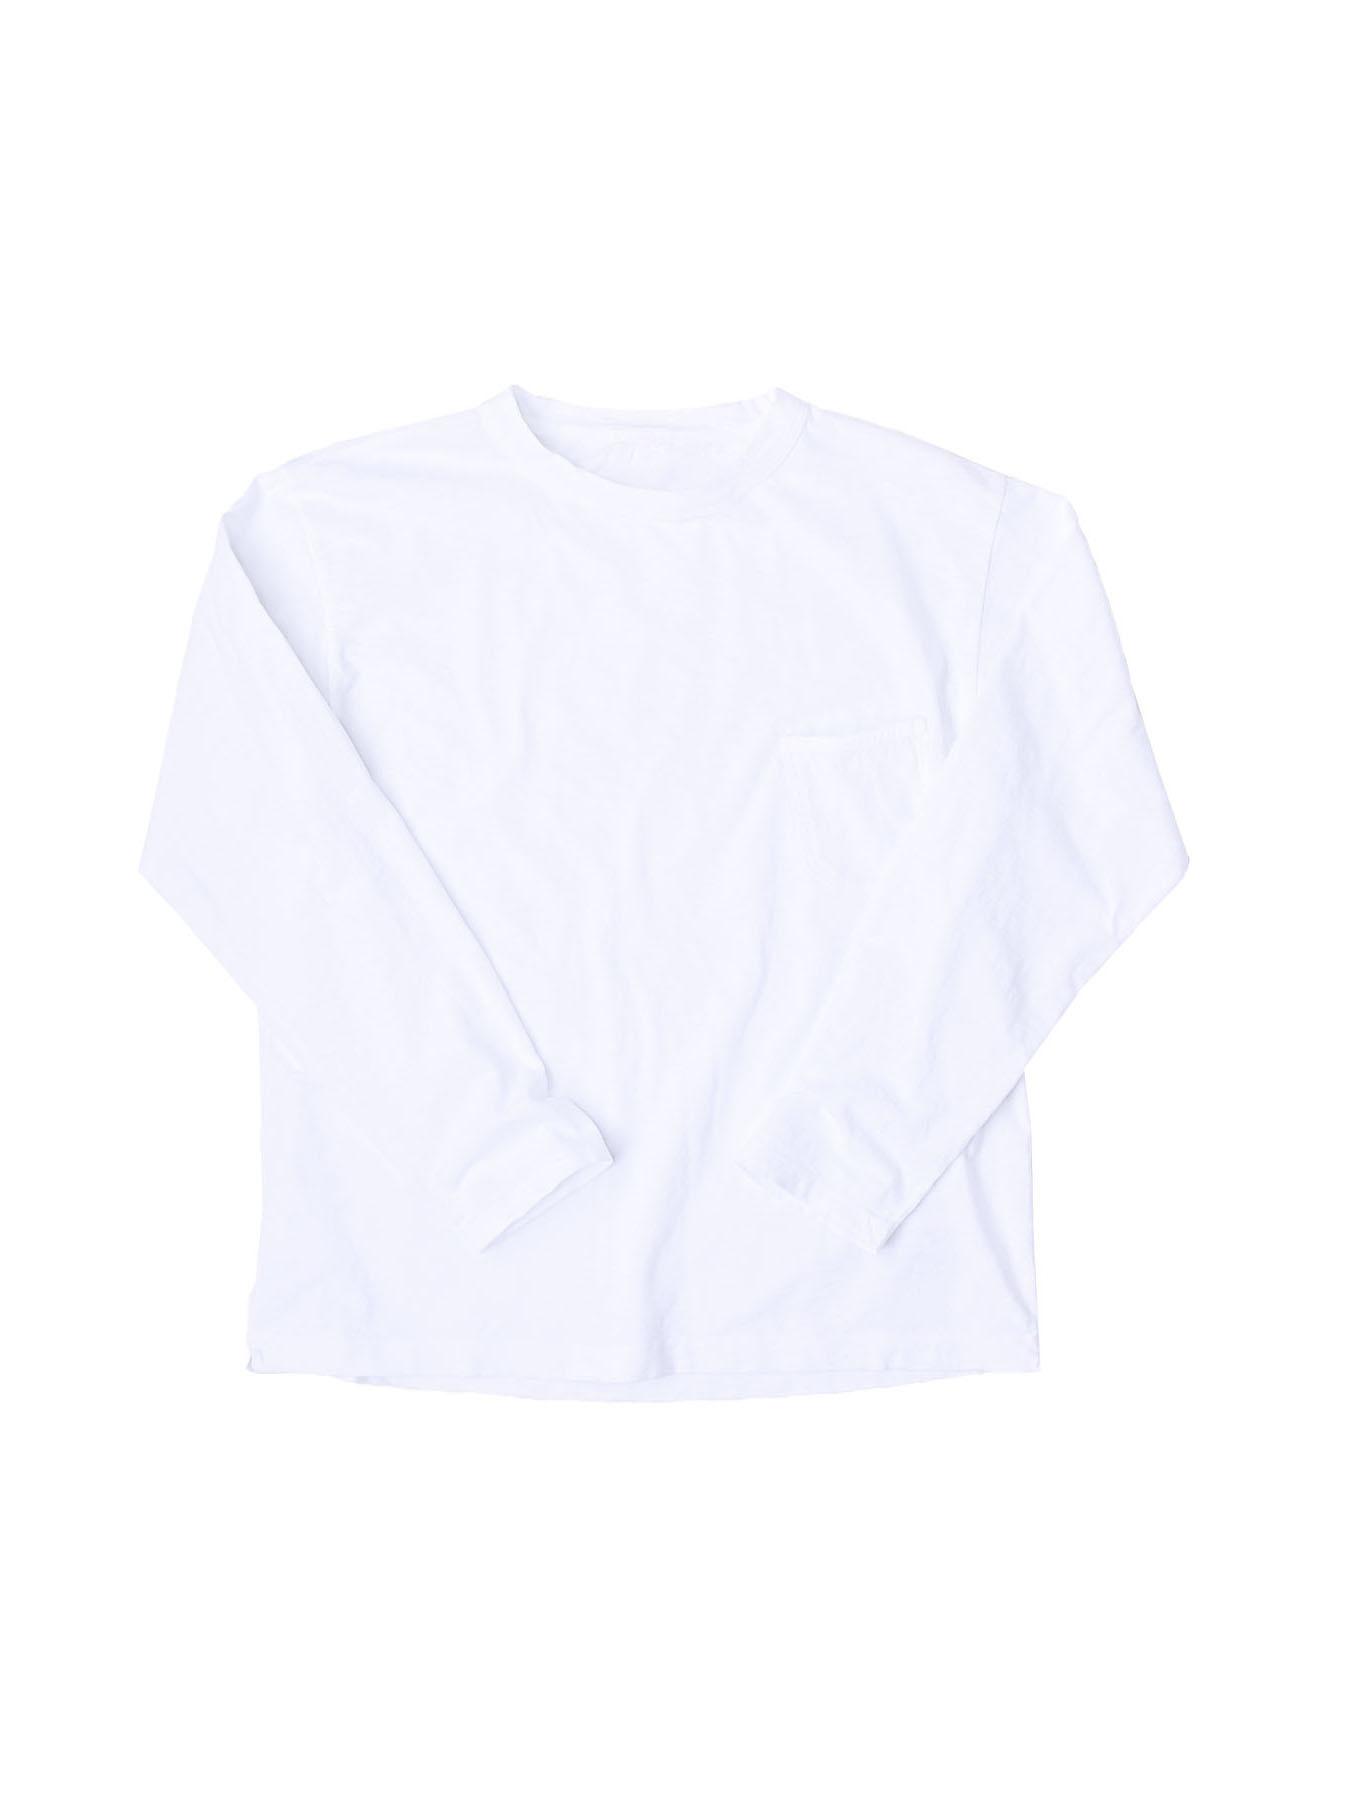 Zimbabwe Cotton 908 Ocean Long-sleeved T-shirt-1